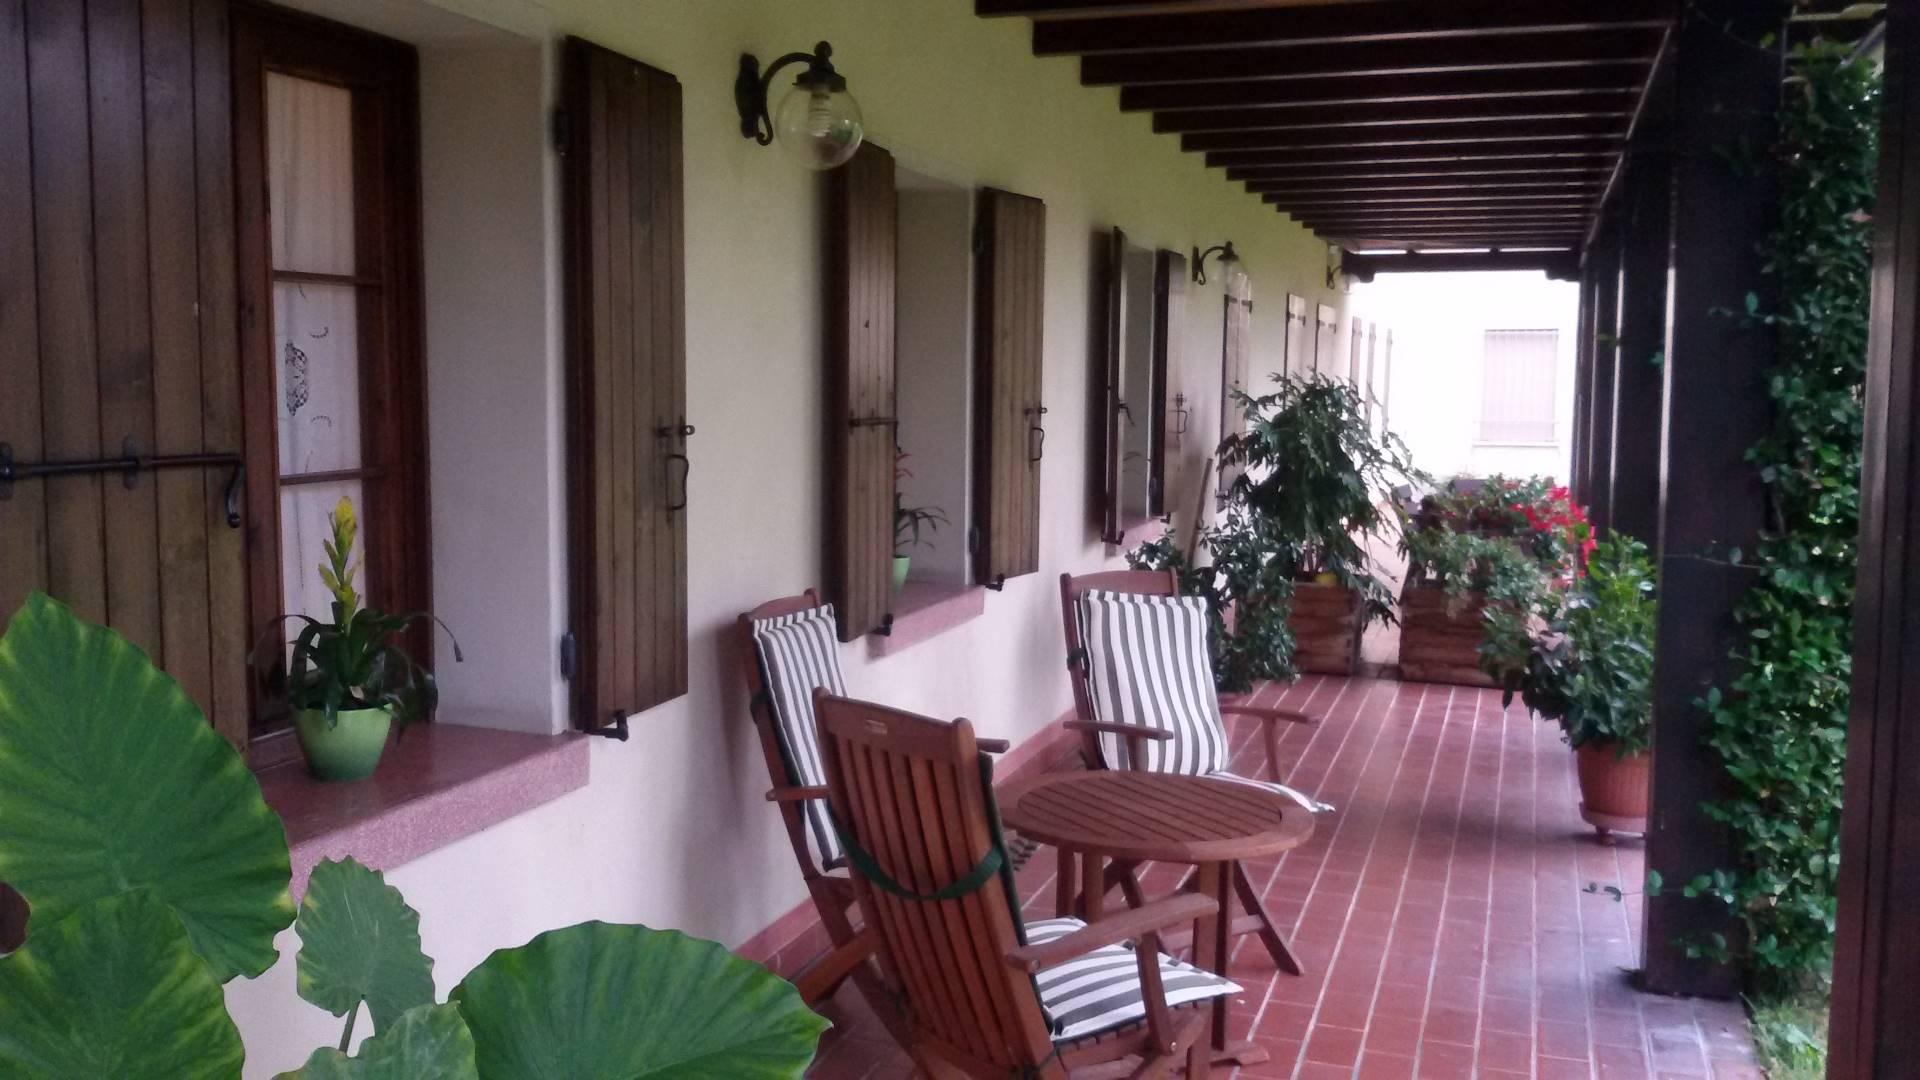 Villa Bifamiliare in Vendita a Salgareda